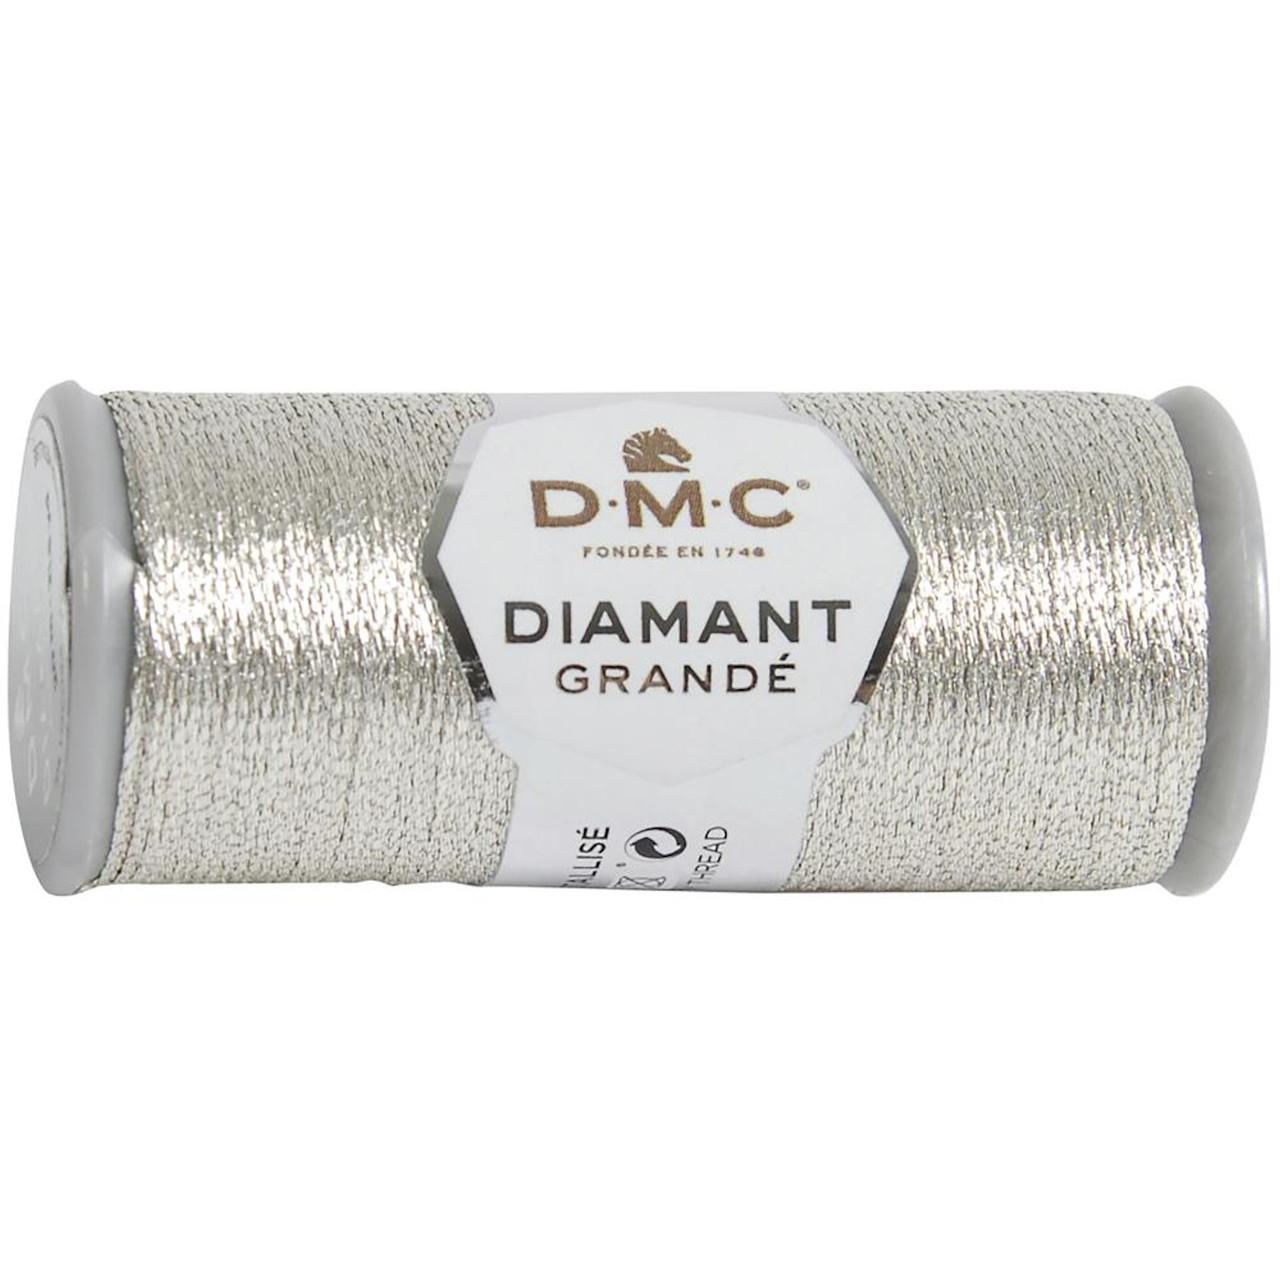 DMC - 21.8 Yard Spool of Light Silver Diamant Grande Metallic Thread #G168